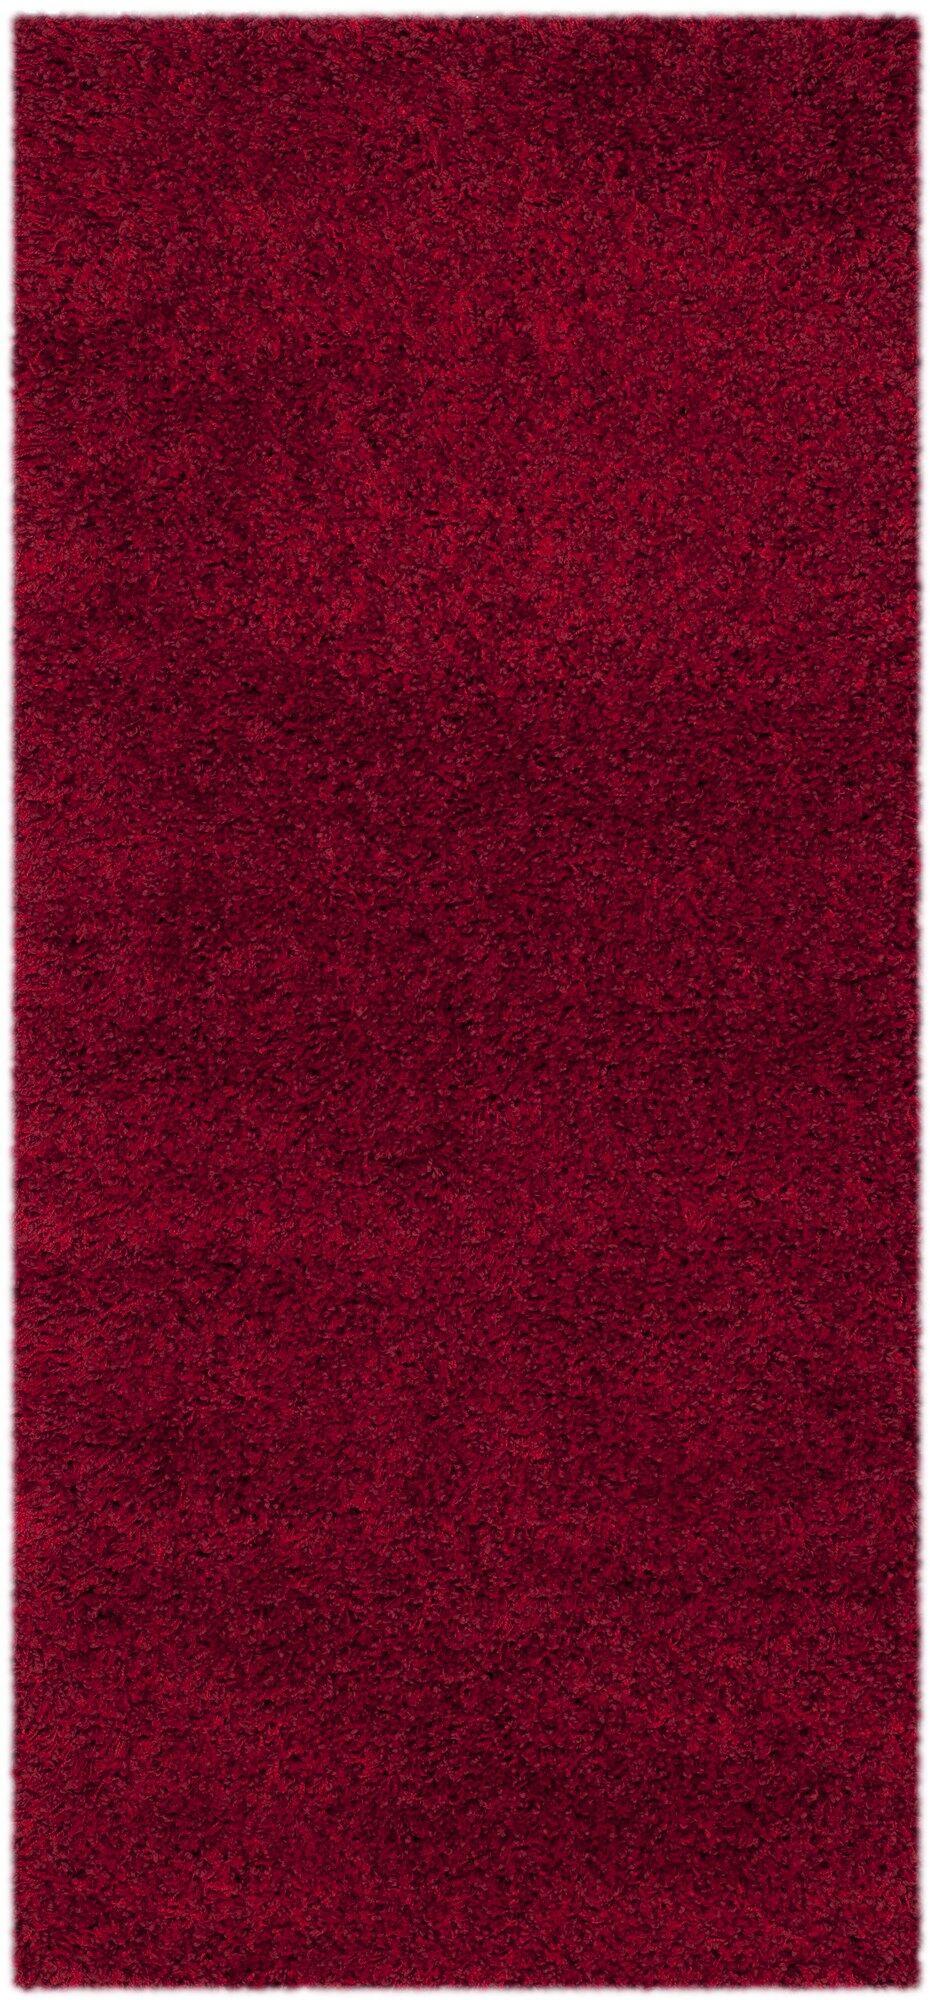 Rowen Handmade Red Area Rug Rug Size: Runner 2'3